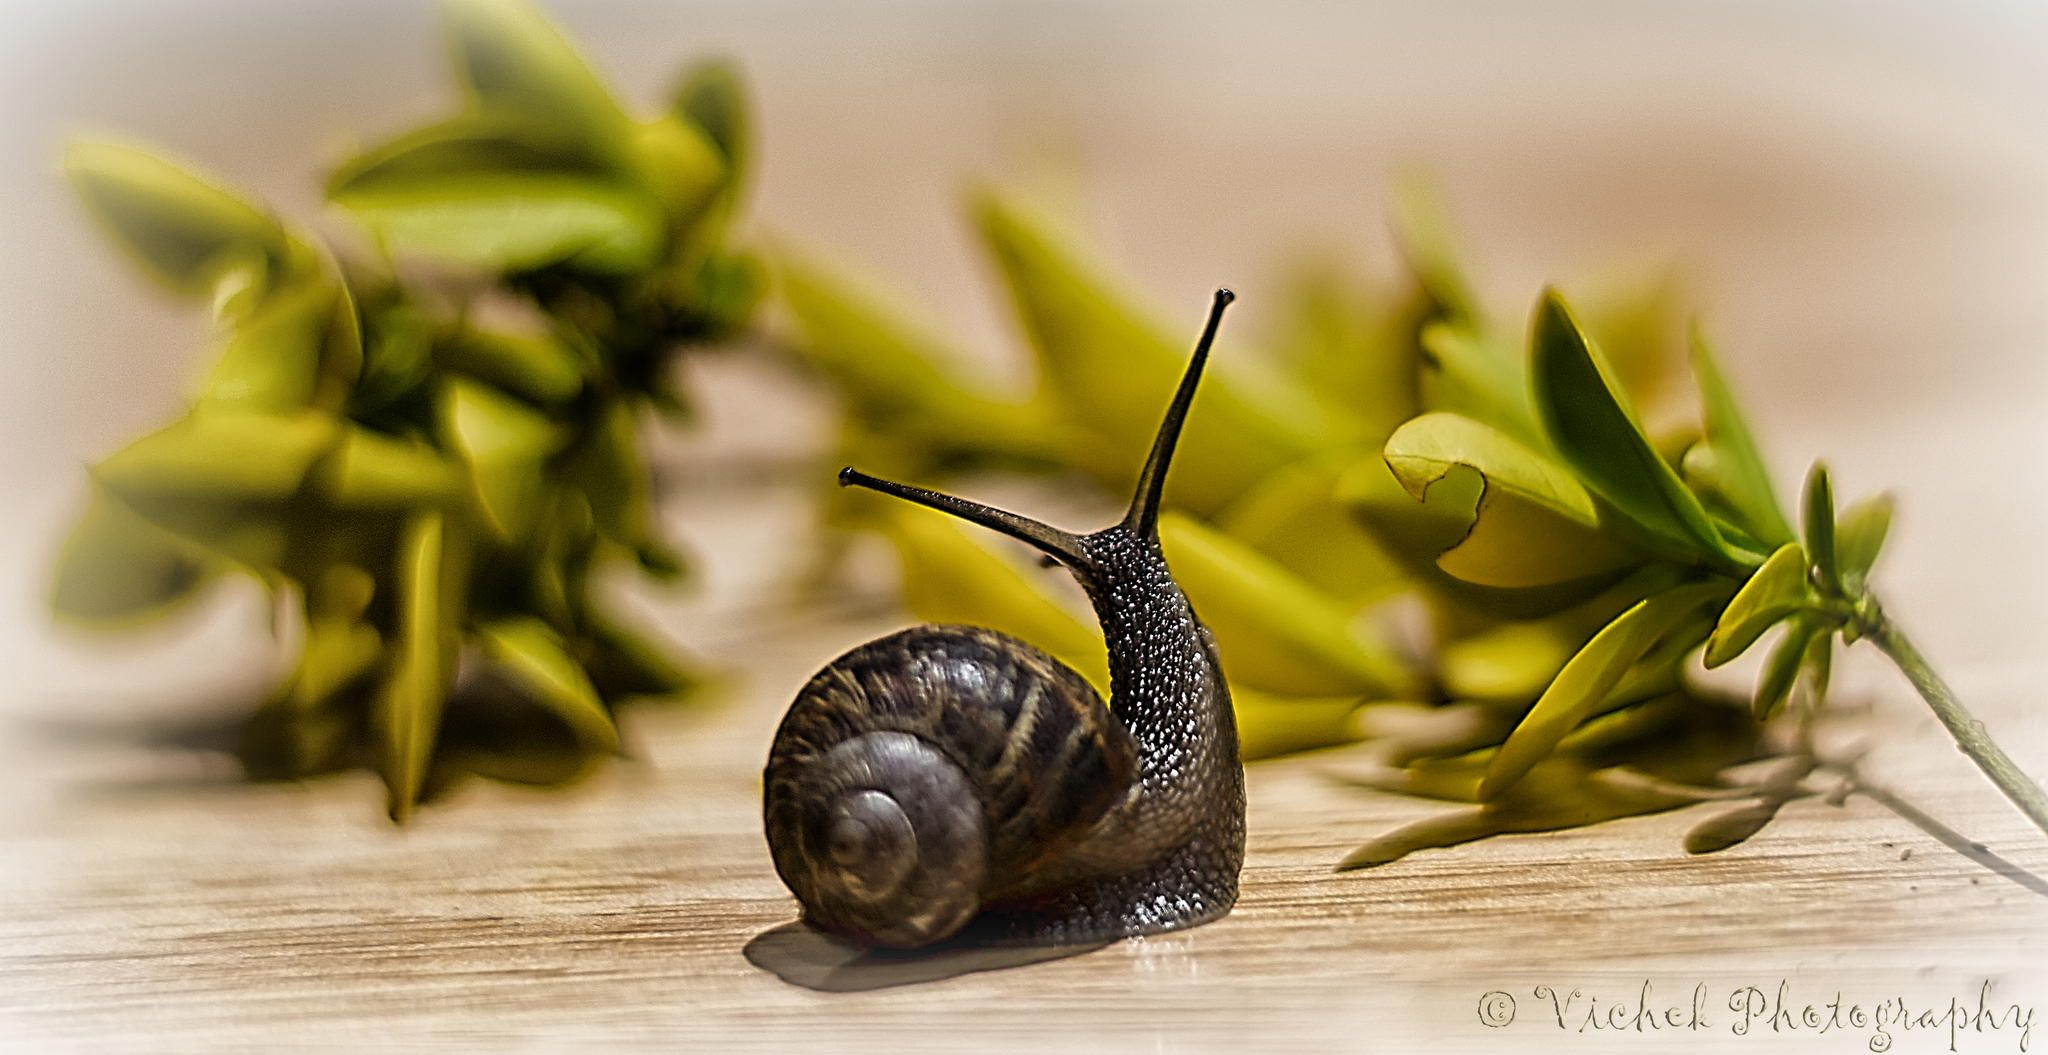 Stenly the Snail by Viktor Stefanov on 500px